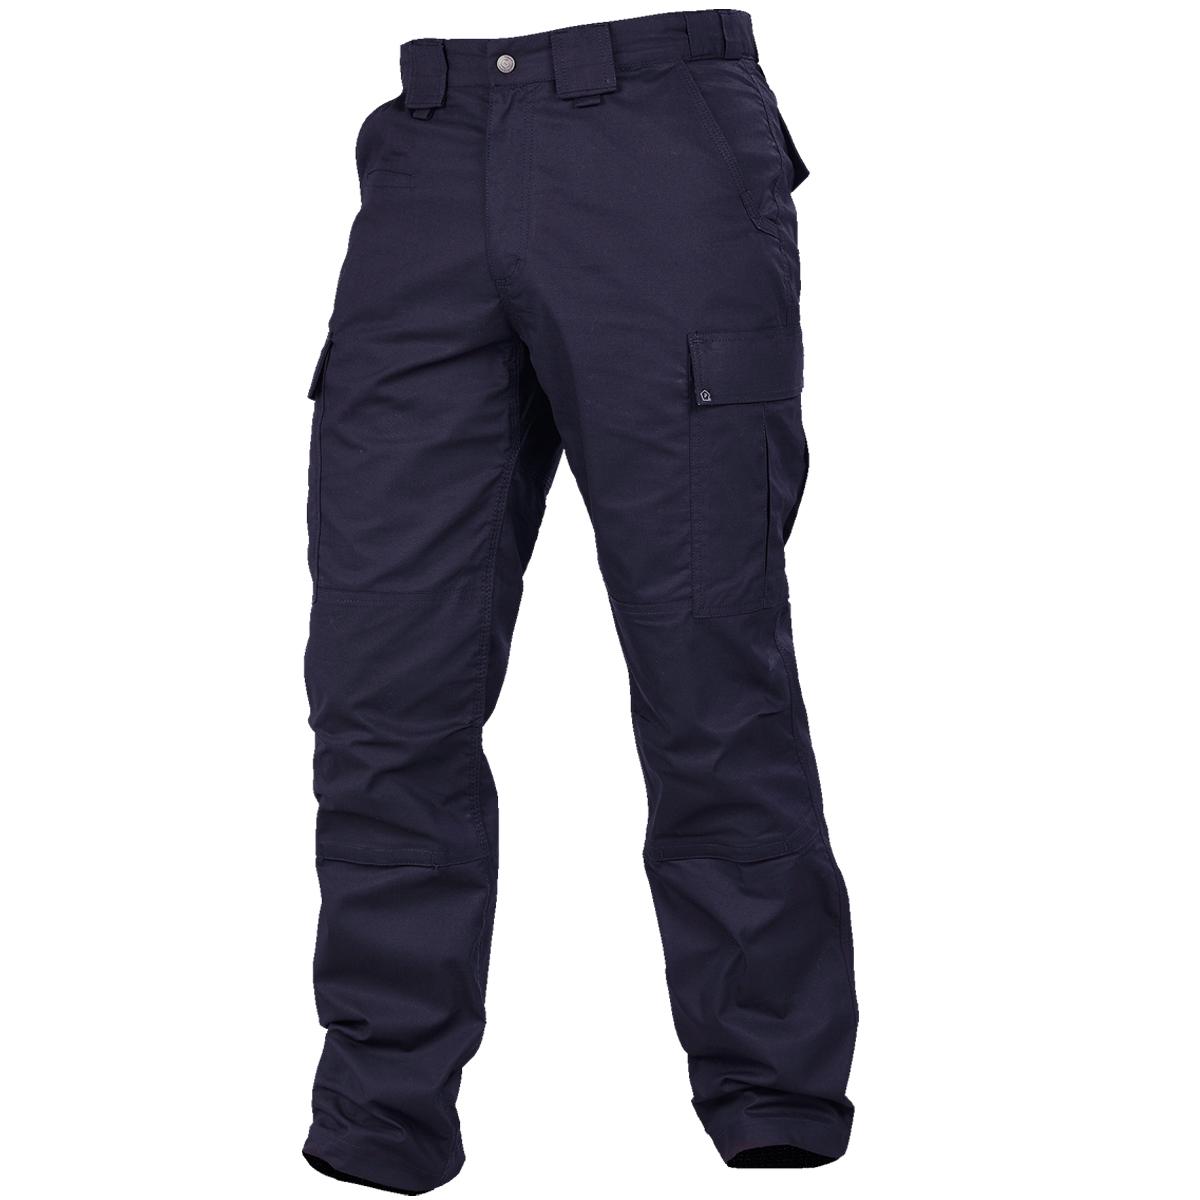 Vigilante Clothing Uk